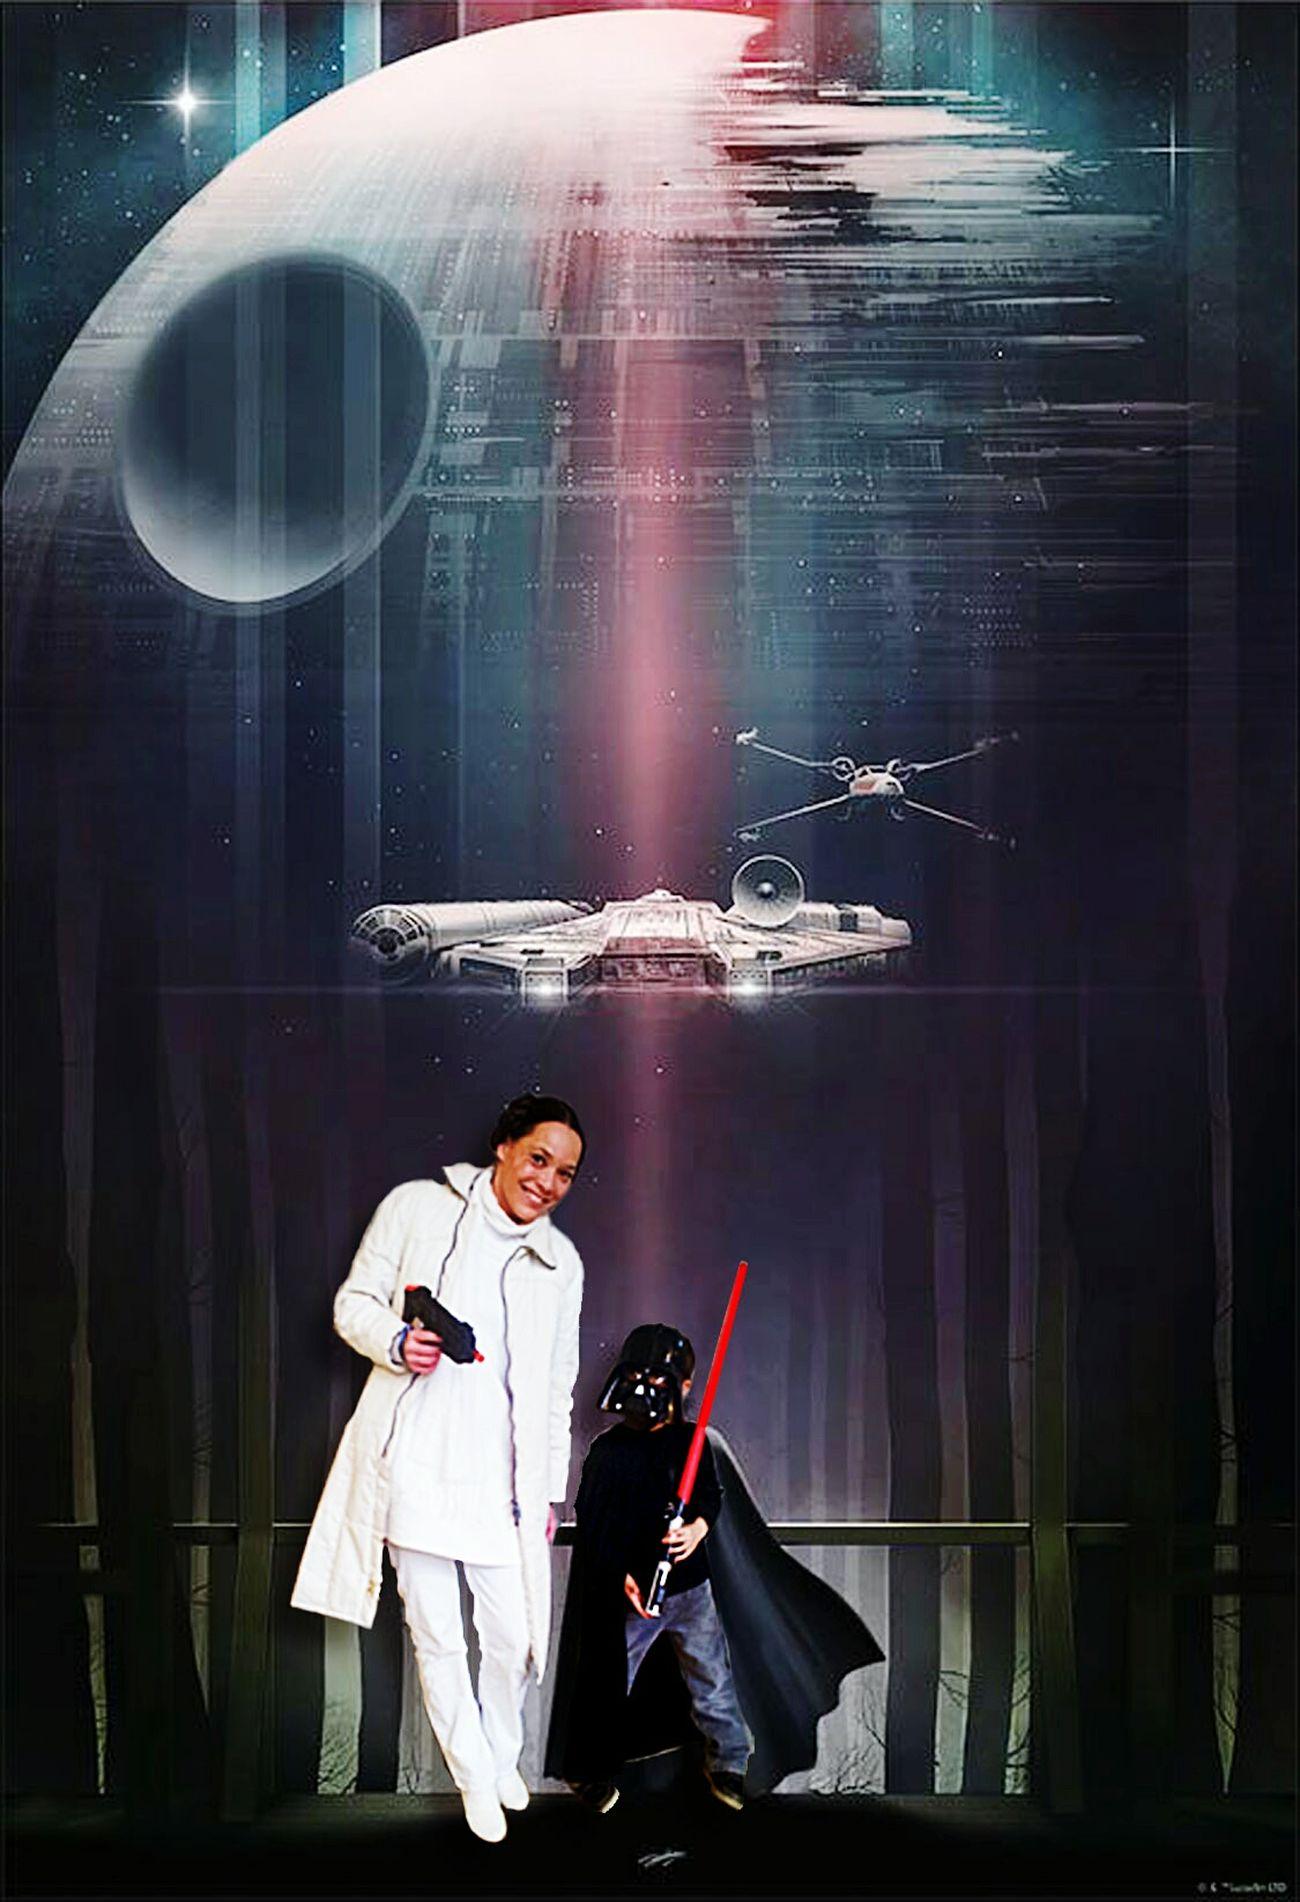 Starwars Star Wars Princess Leia Darthvader Darth Vader Starwarskid Starwarstime Star Wars Fun